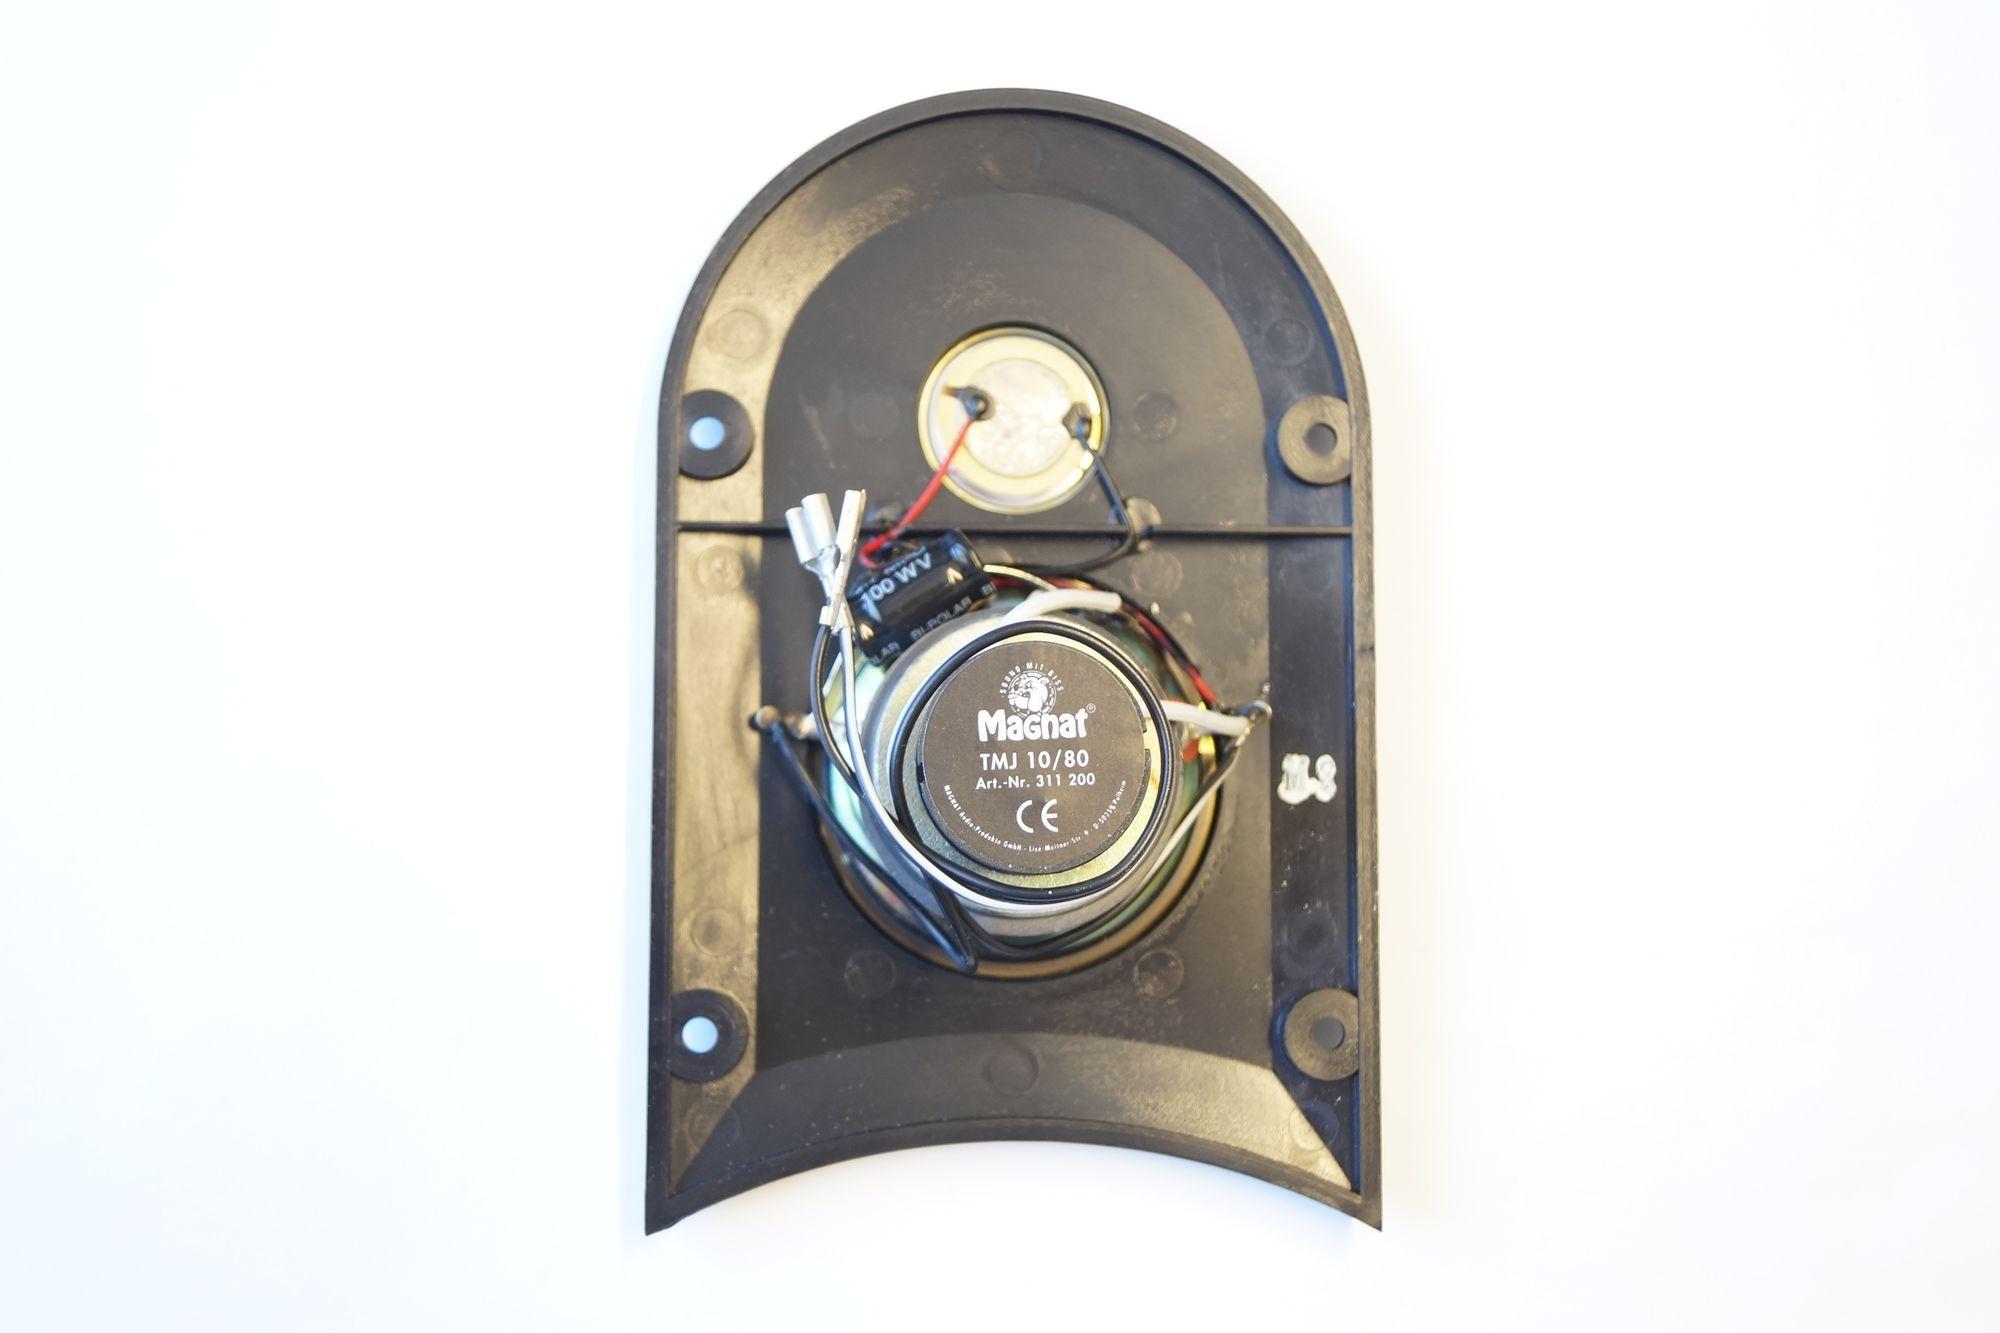 1 Paar 2-Wege universal Hoch Mittelton Einheit Magnat TMJ 10/80 S 160 Watt max – Bild 2